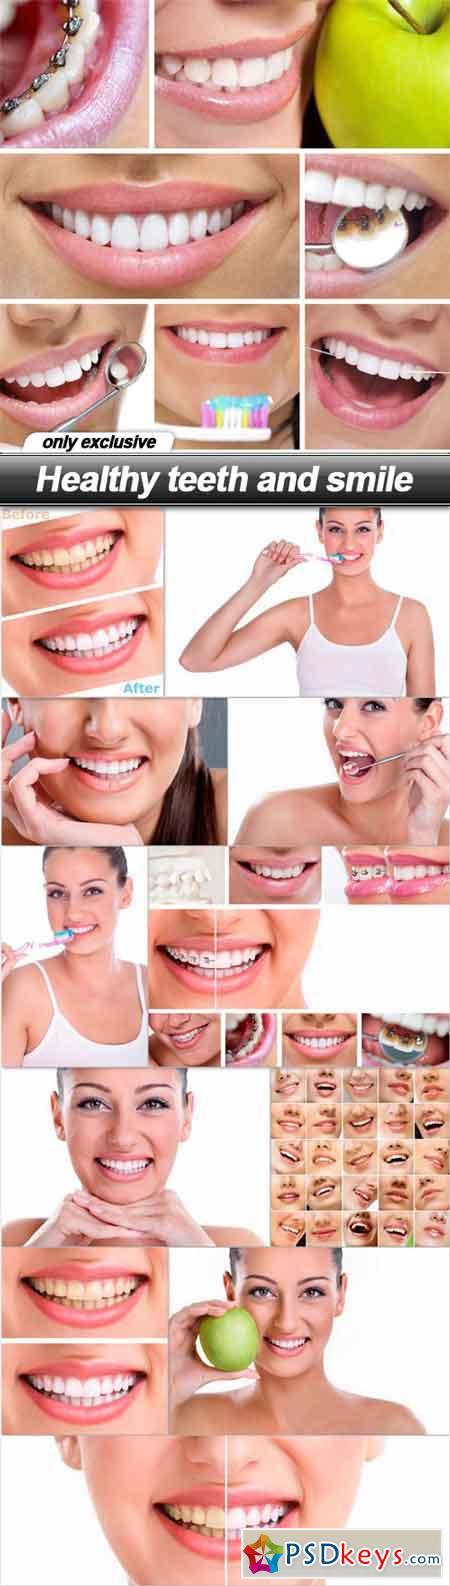 Healthy teeth and smile - 12 UHQ JPEG